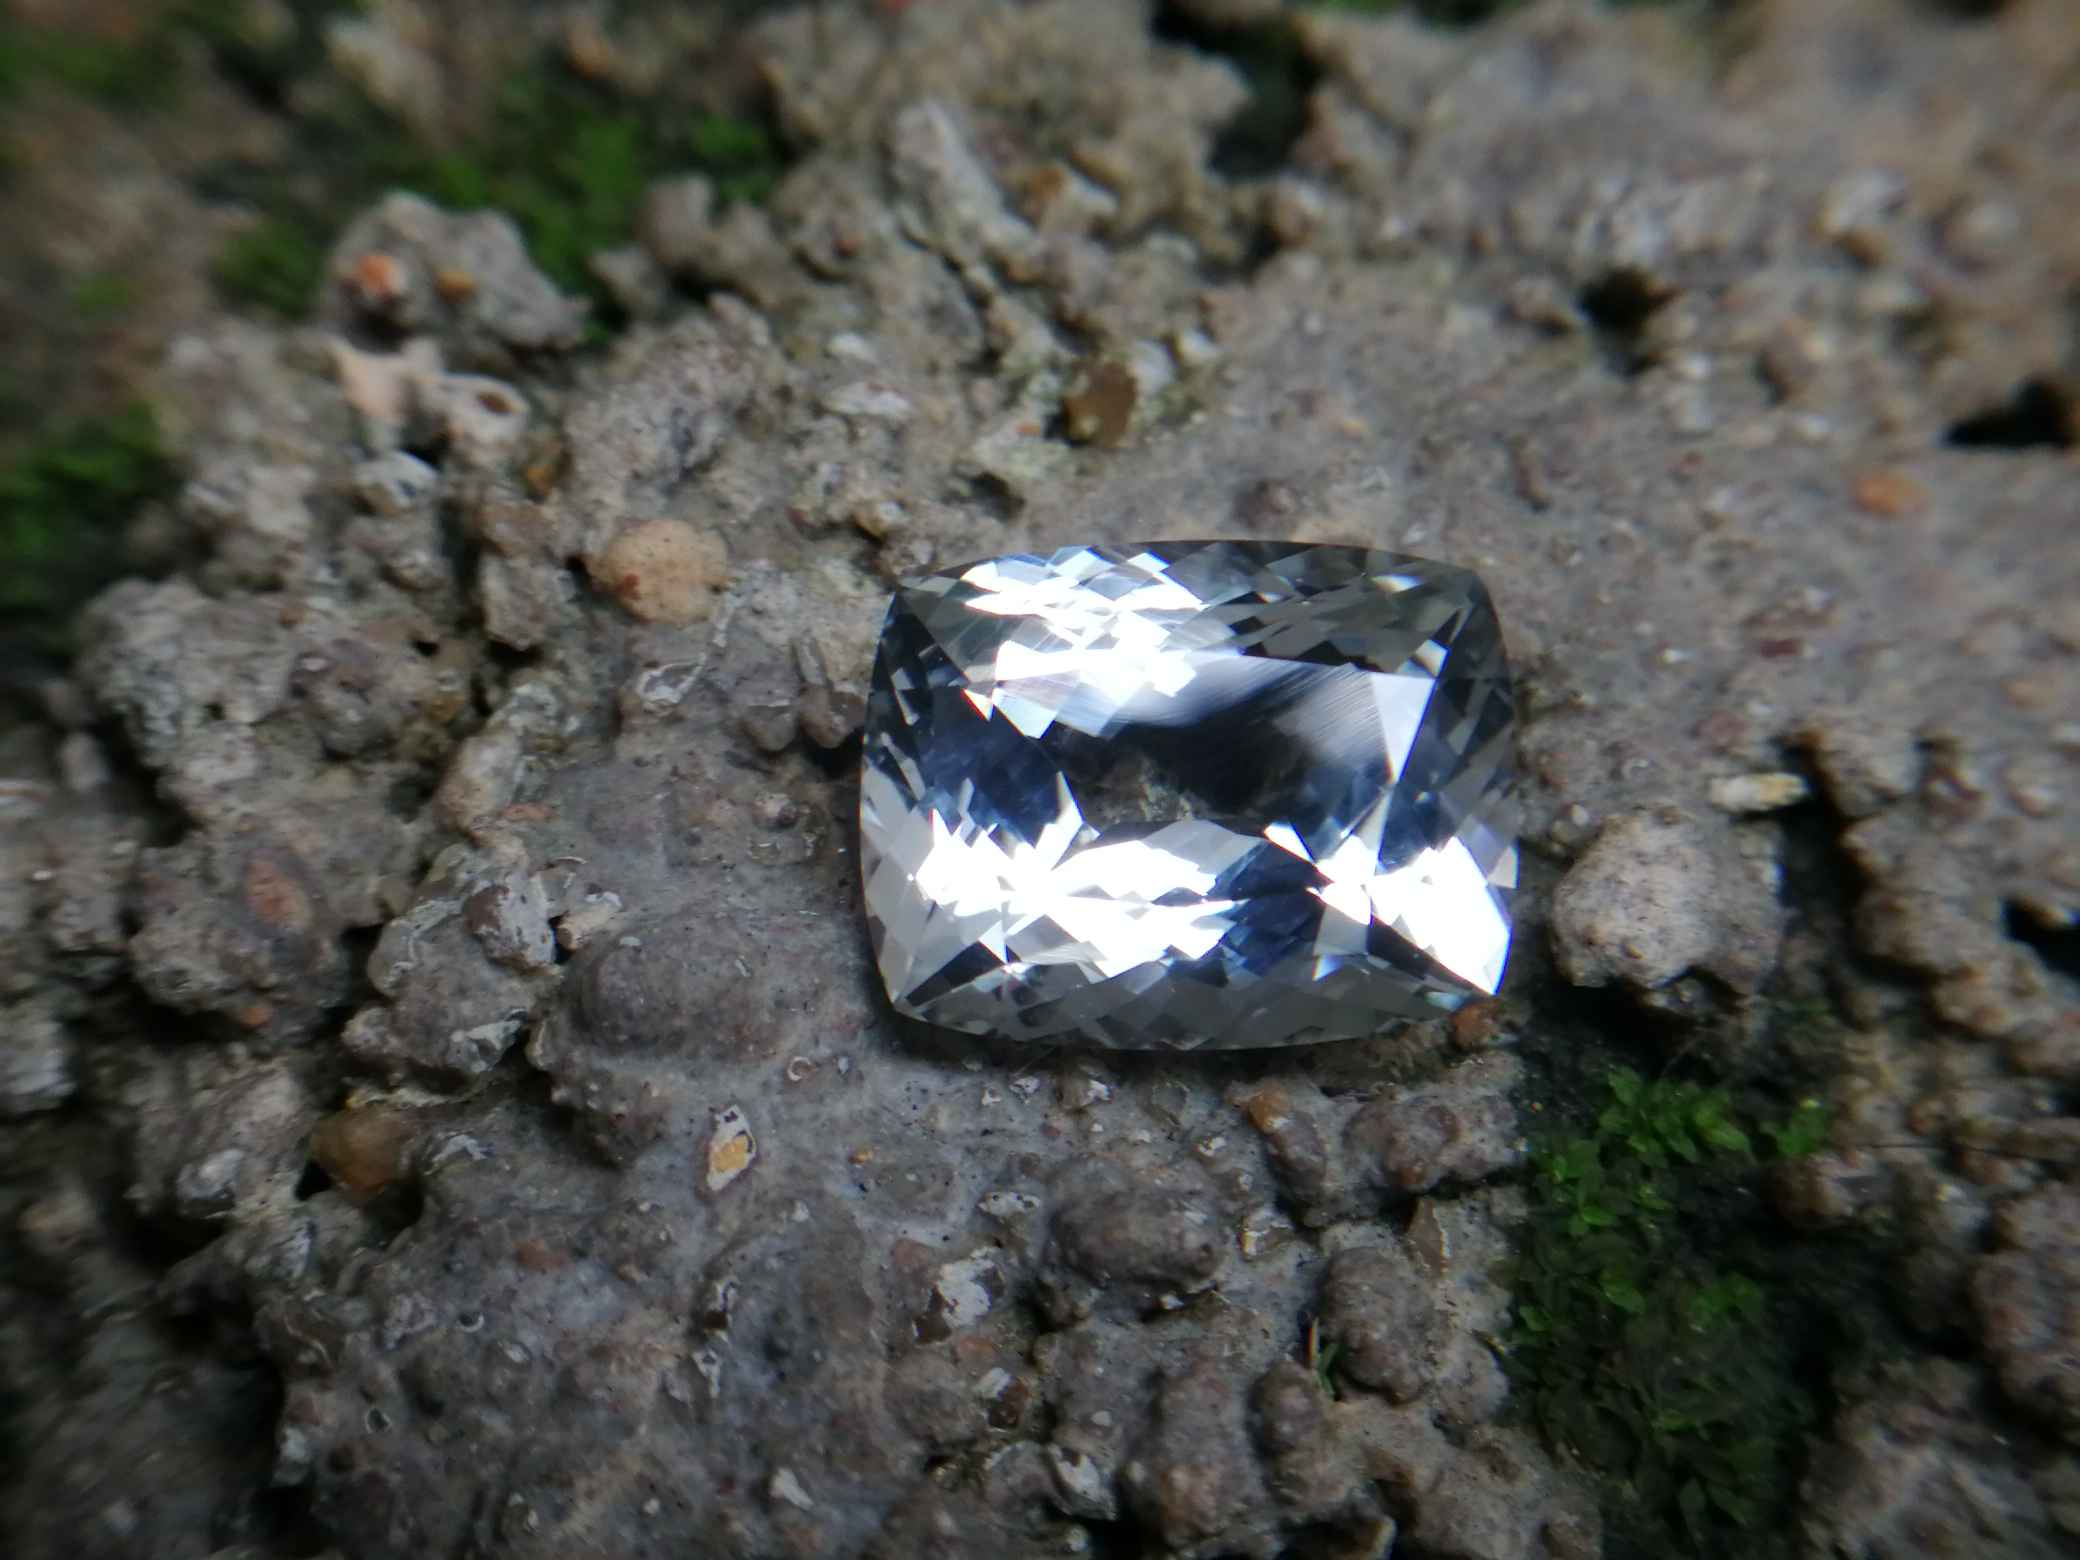 Colour : White Shape : Cushion Weight : 9.66 Cts Dimension : 14.4 x 11.4 x 7.4 mm Treatment : Unheated Clarity : Clean • CSL - Colored Stone Laboratory Certified ( GIA Alumina Association Member ) • CSL Memo No : E96F583A964B 白色托百石 重量 : 9.66 卡拉 尺寸 : 14.4 x 11.4 x 7.4 mm 颜色 : 白色 透明 : 好透明 形状 : 垫形 清晰度 : 清洁 治疗:没有加热